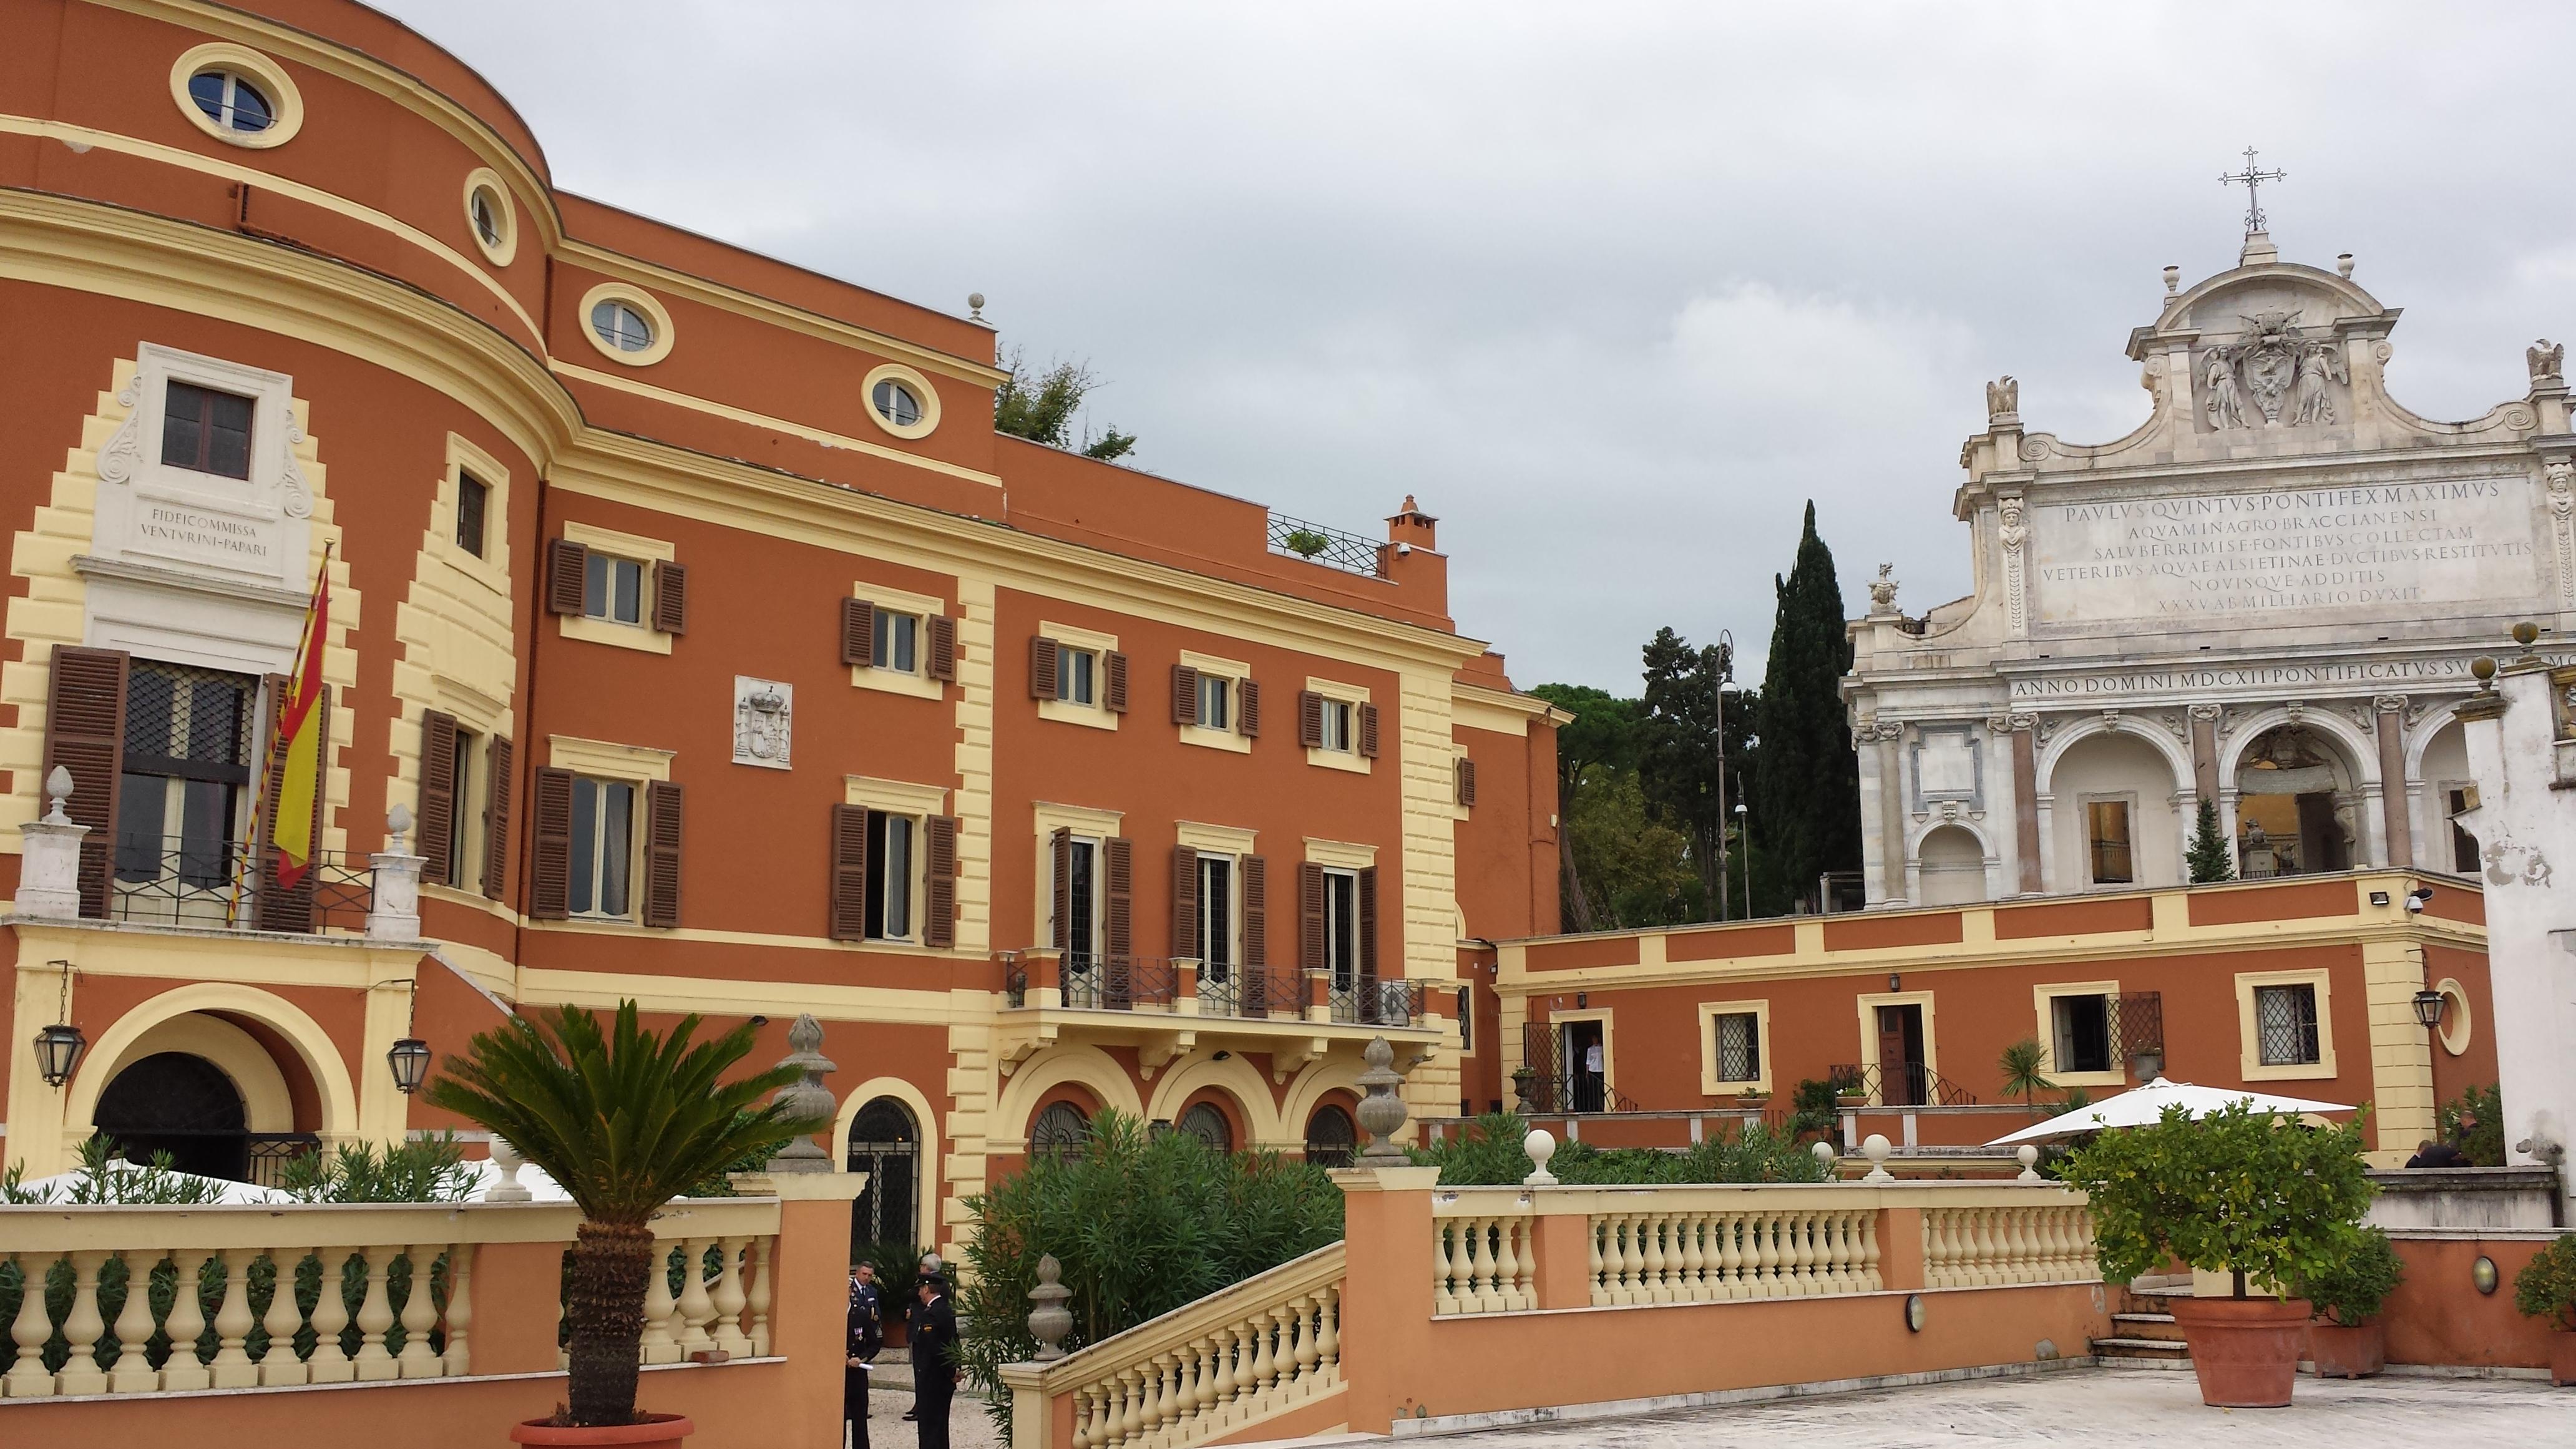 301 moved permanently - Embaja de espana ...